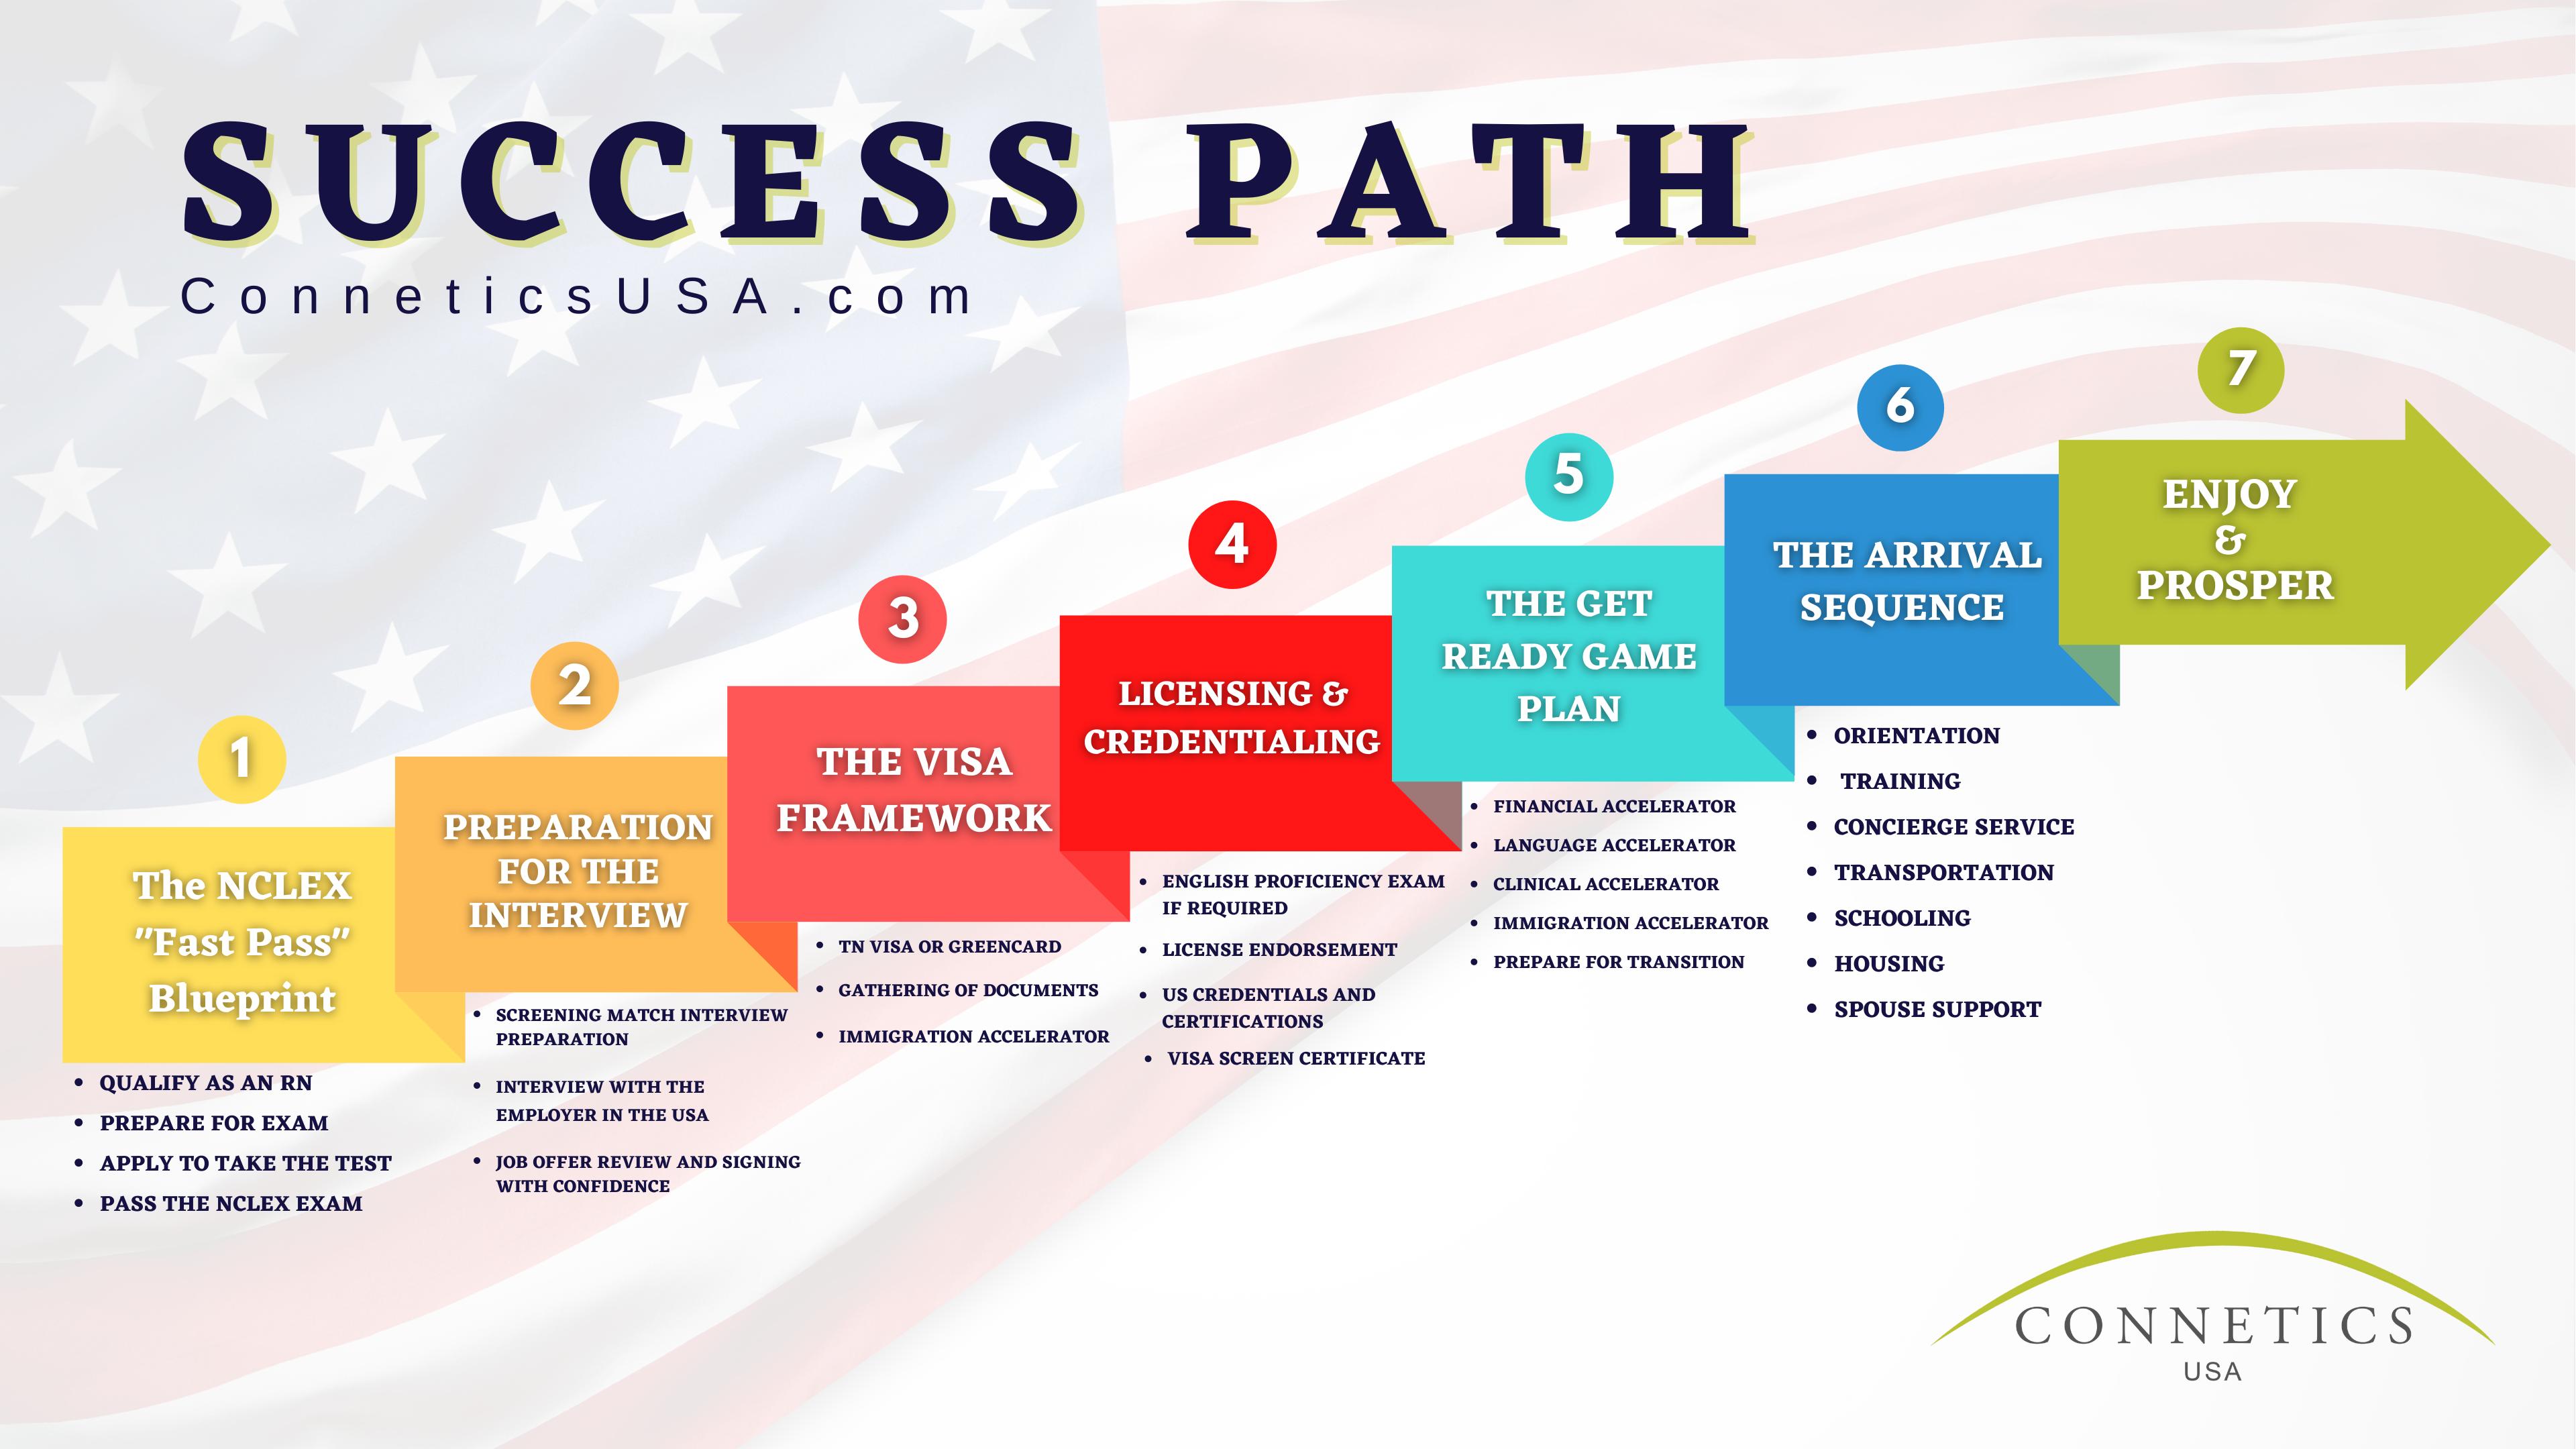 Connetics USA - Success path